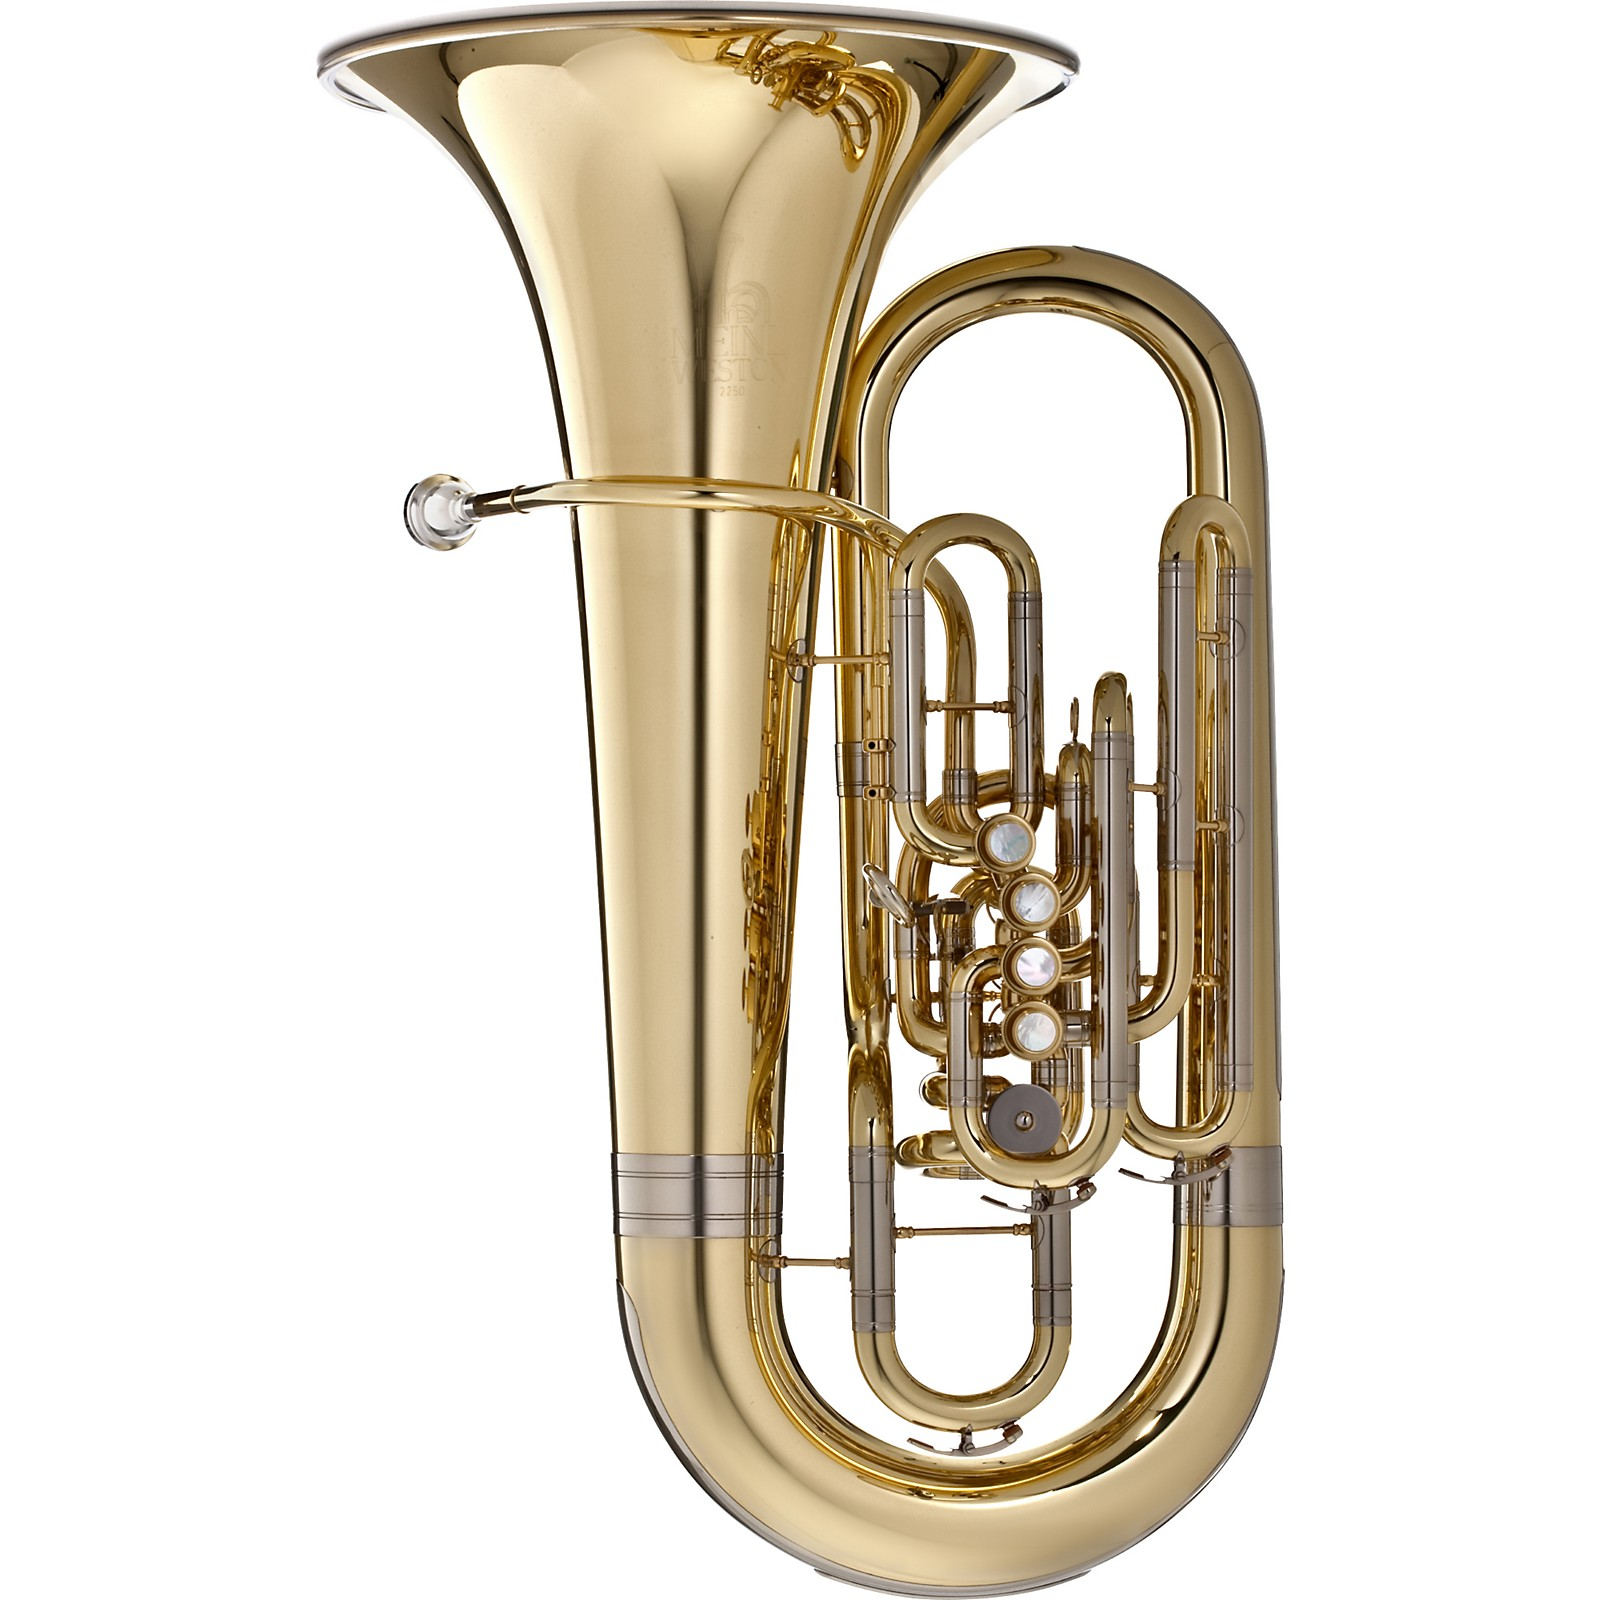 Meinl Weston 2250 Series 5-Valve 6/4 F Tuba